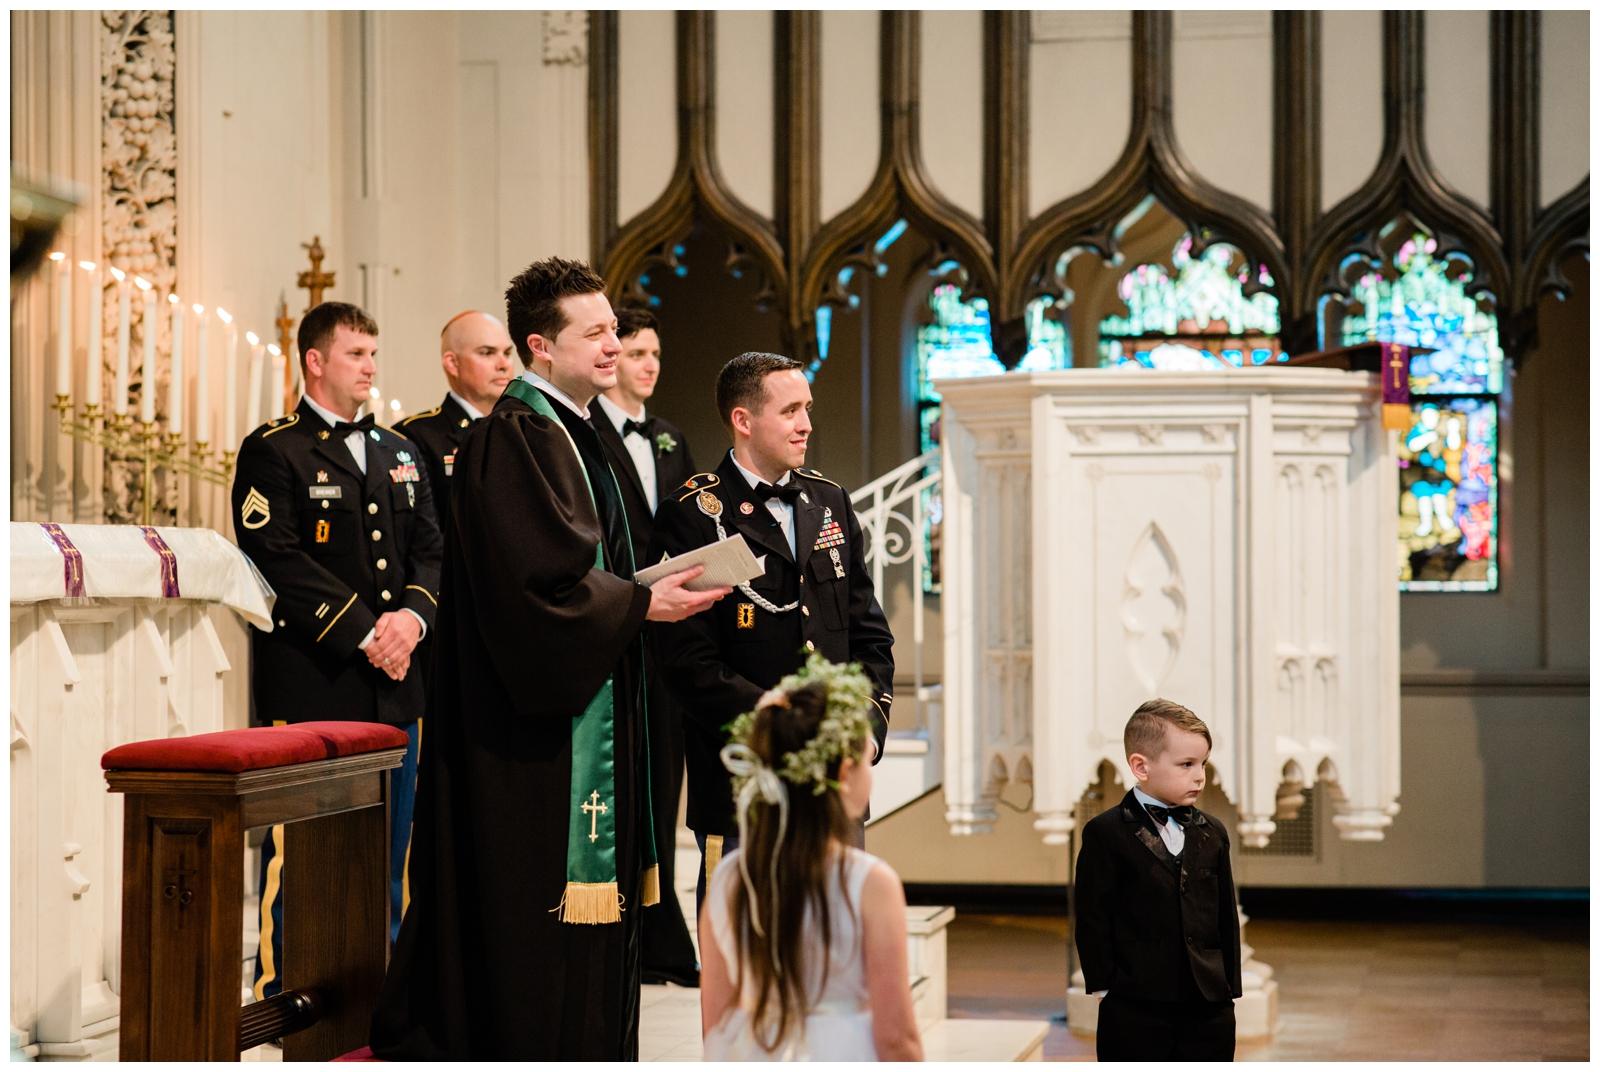 Zola-Austin-Atlanta-Peachtree-Christian-Church-Chastain-Horse-Park-Wedding-0035.jpg